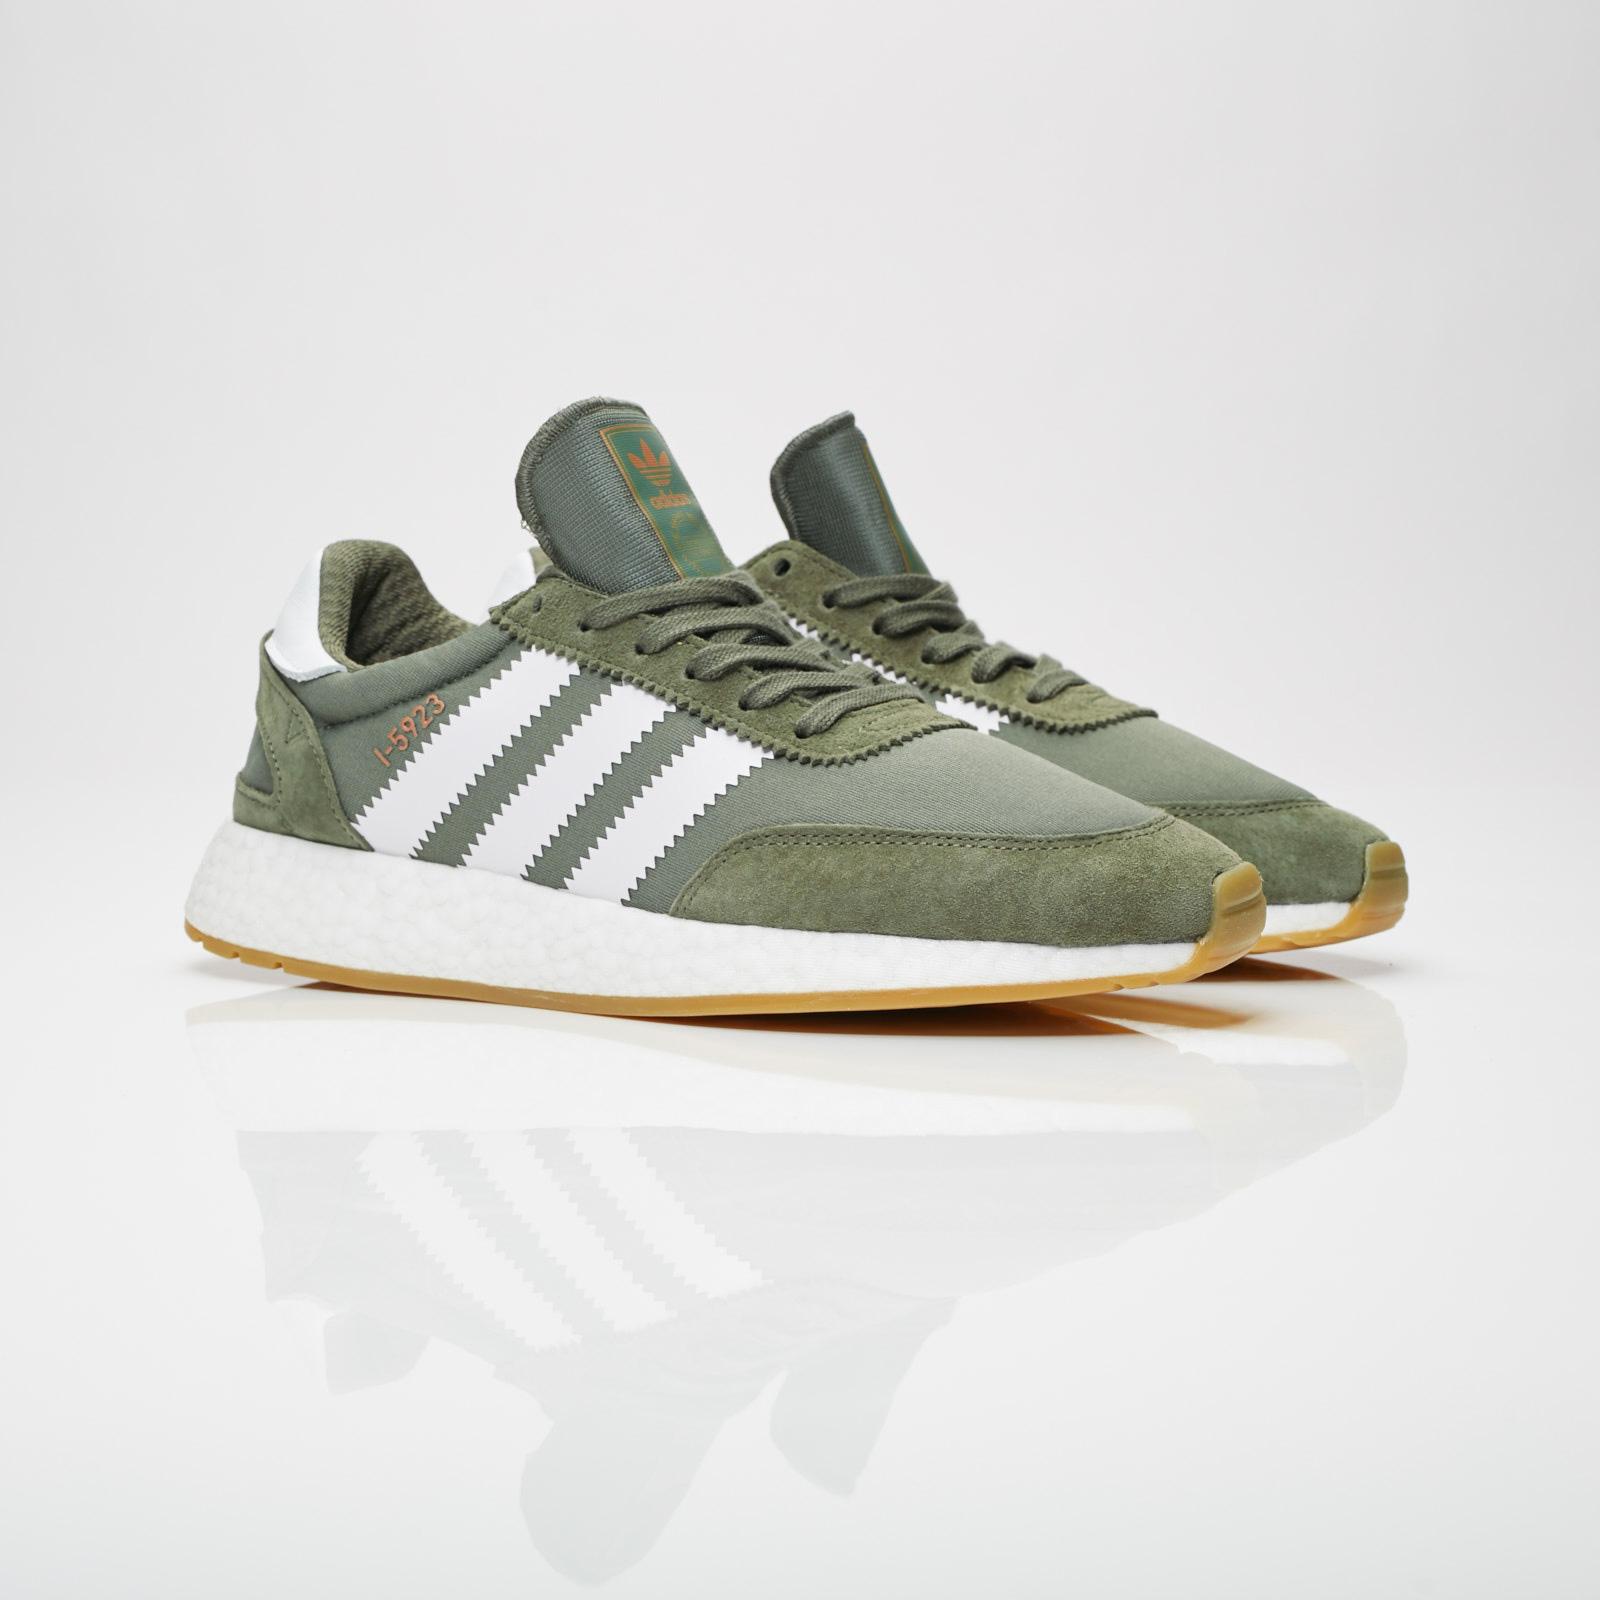 Adidas I 5923 Cq2492 Sneakersnstuff Sneakers